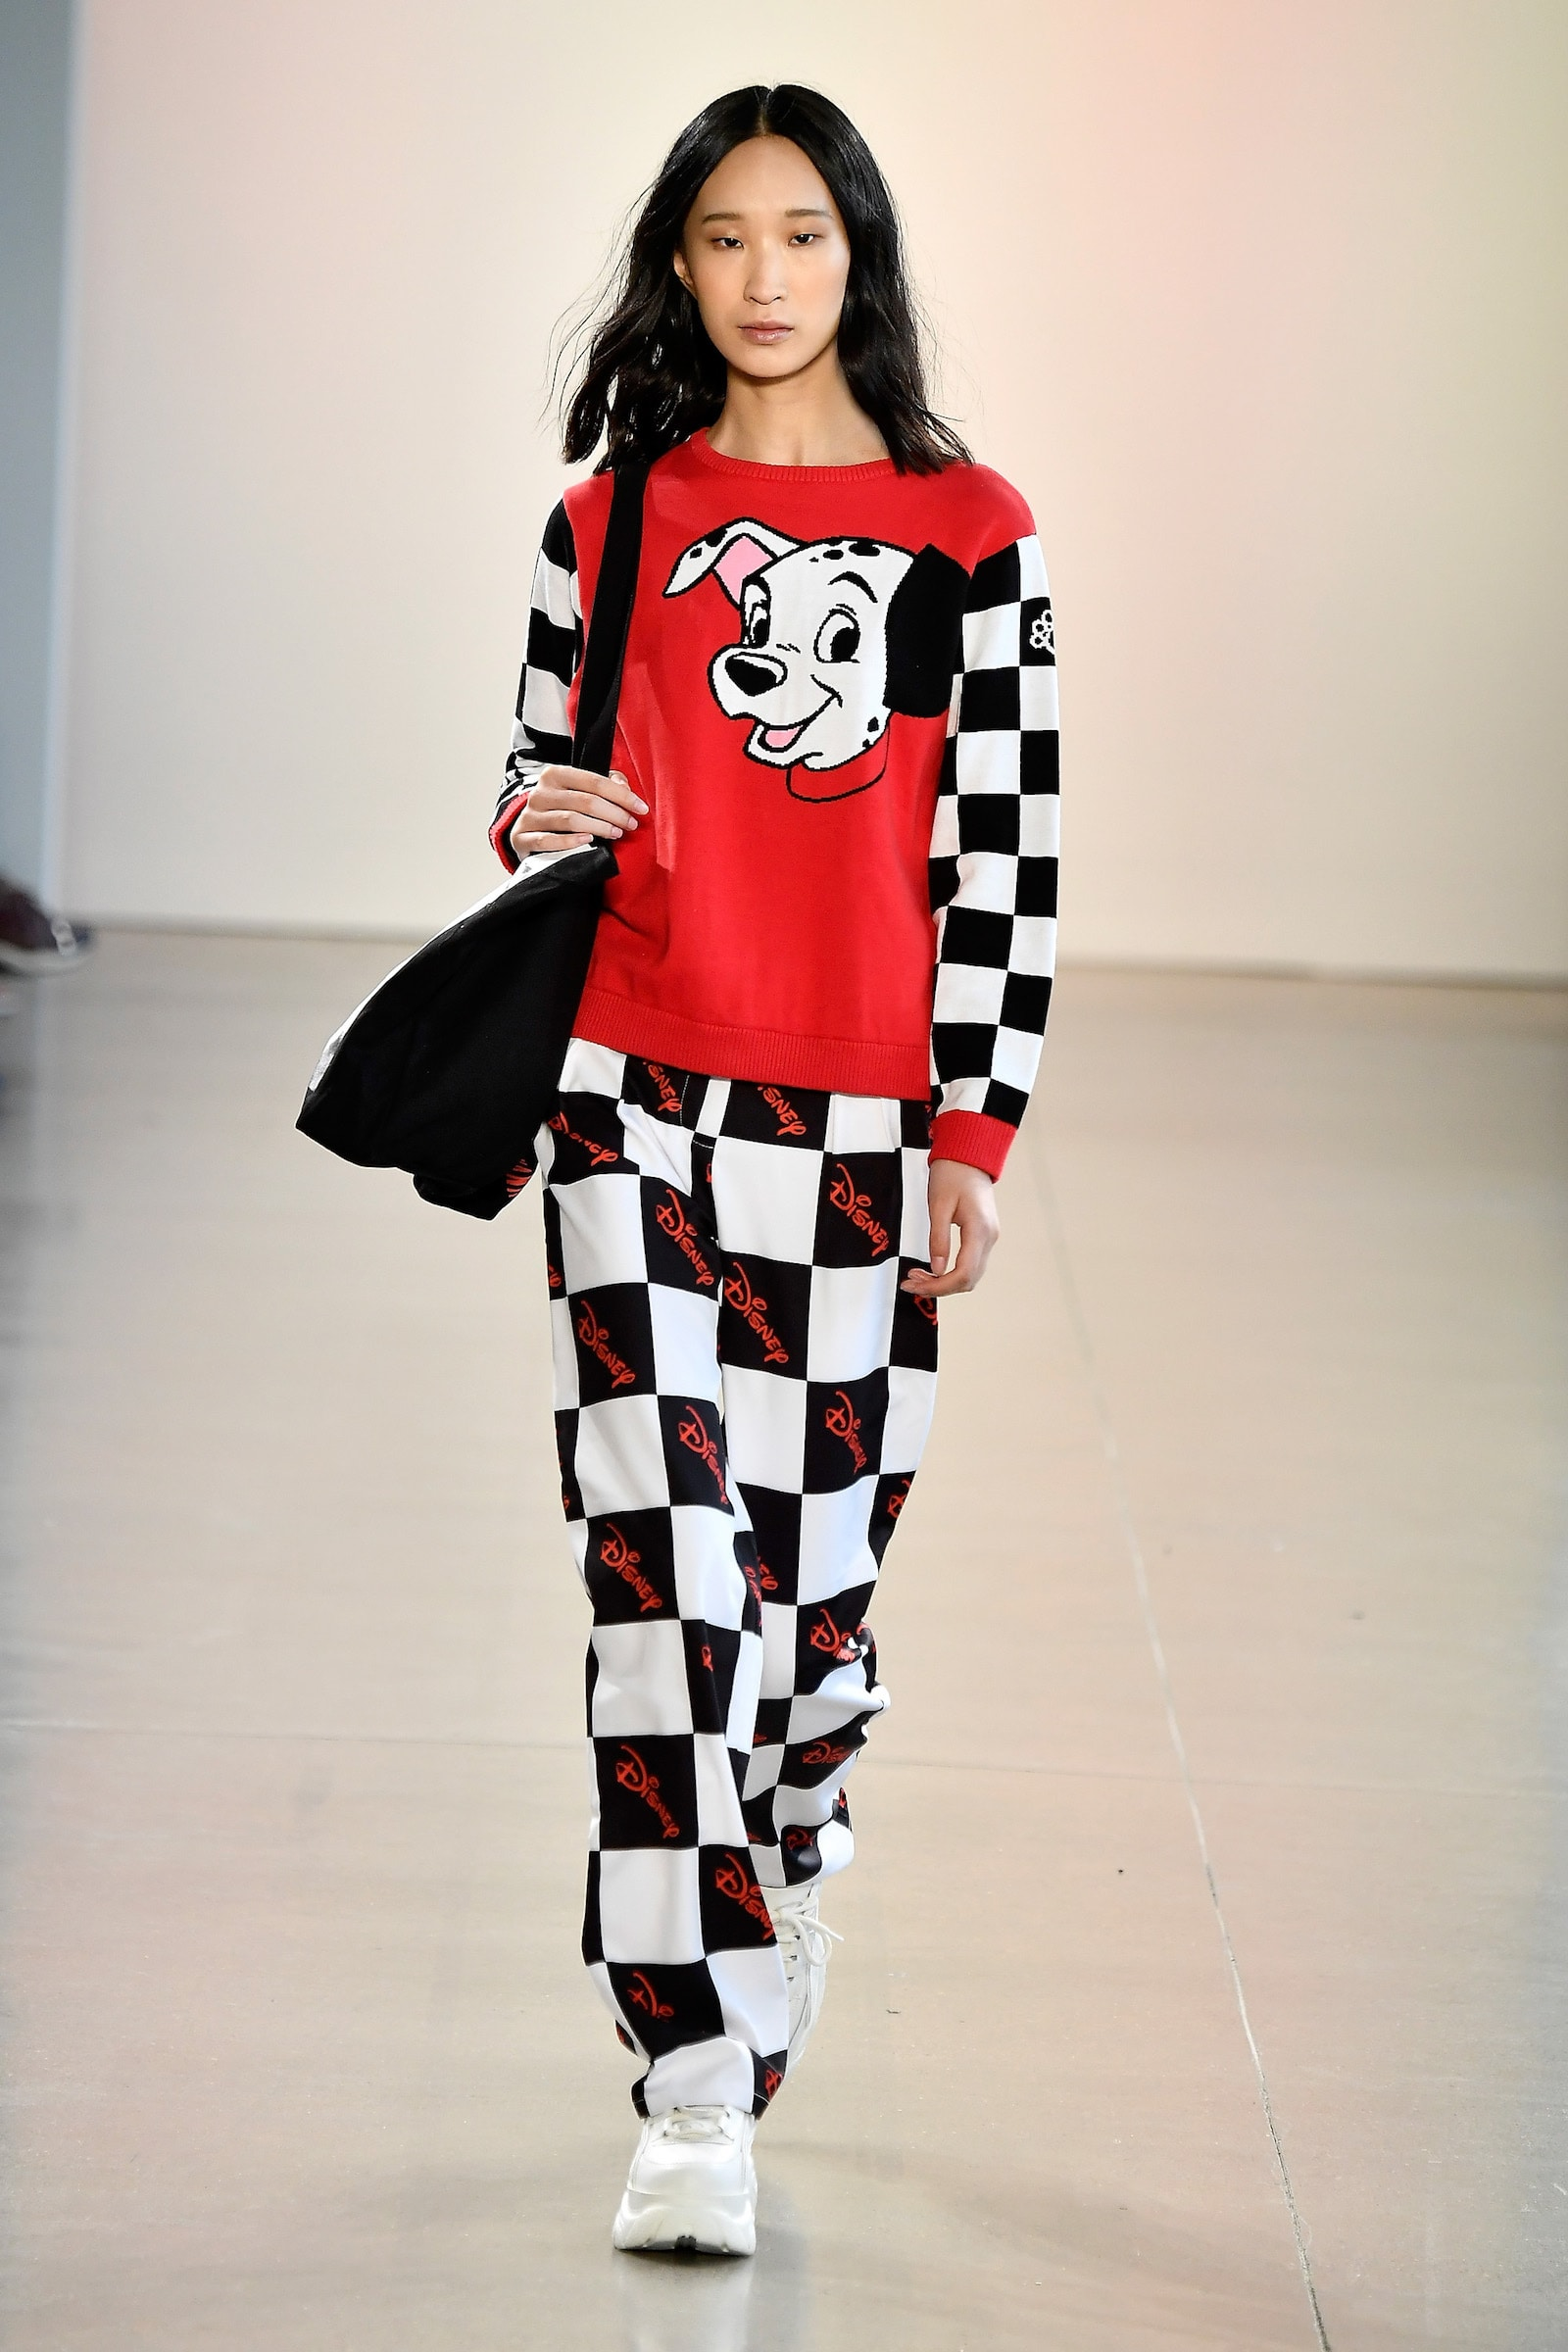 Model sporting 101 Dalmatian outfit by NANA JUDY